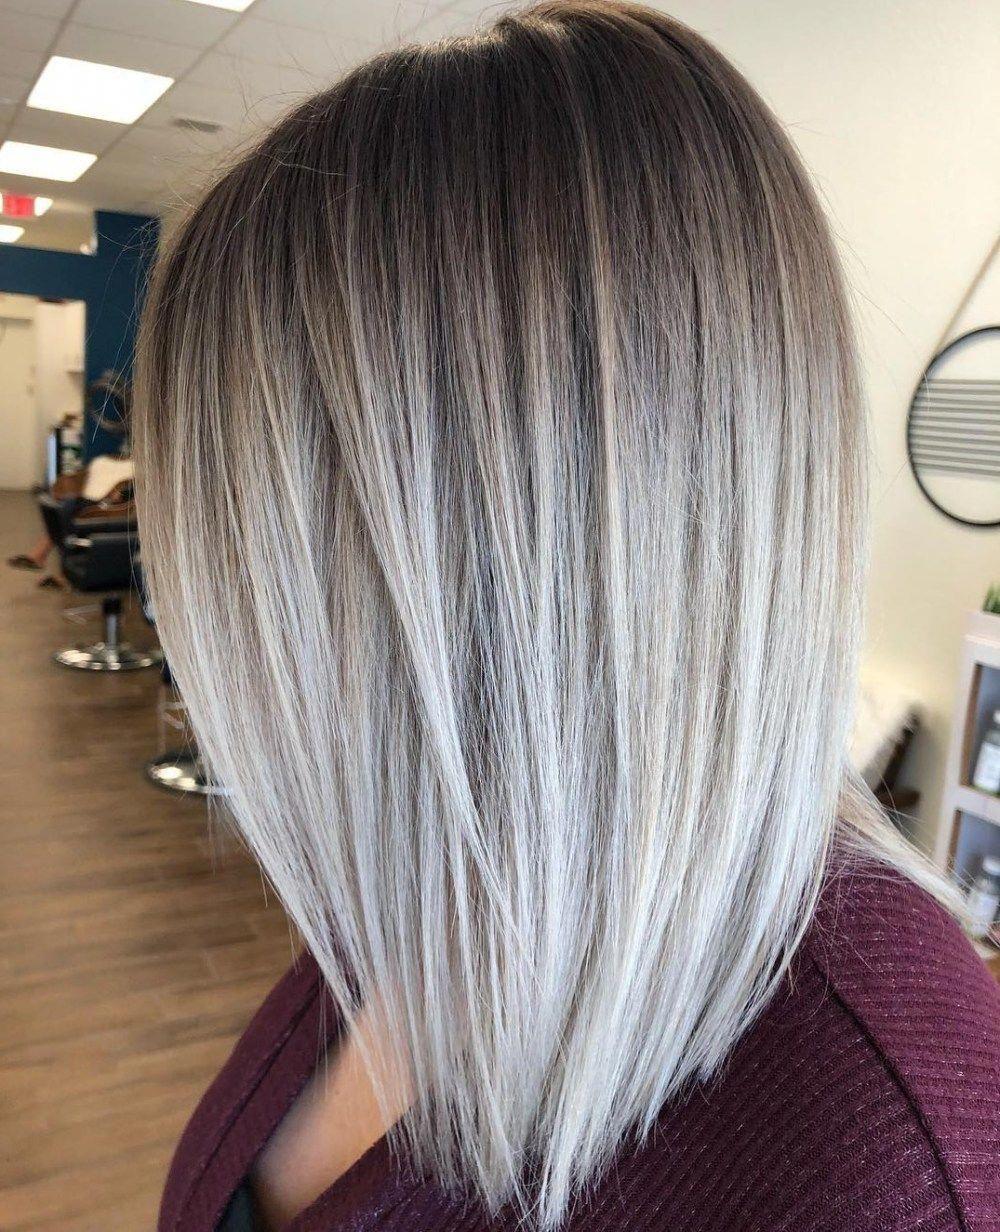 Very Stylish Blonde Balayage Short Hair Blondebalayageshorthair Medium Length Hair Styles Blonde Hair With Roots Hairstyles For Thin Hair